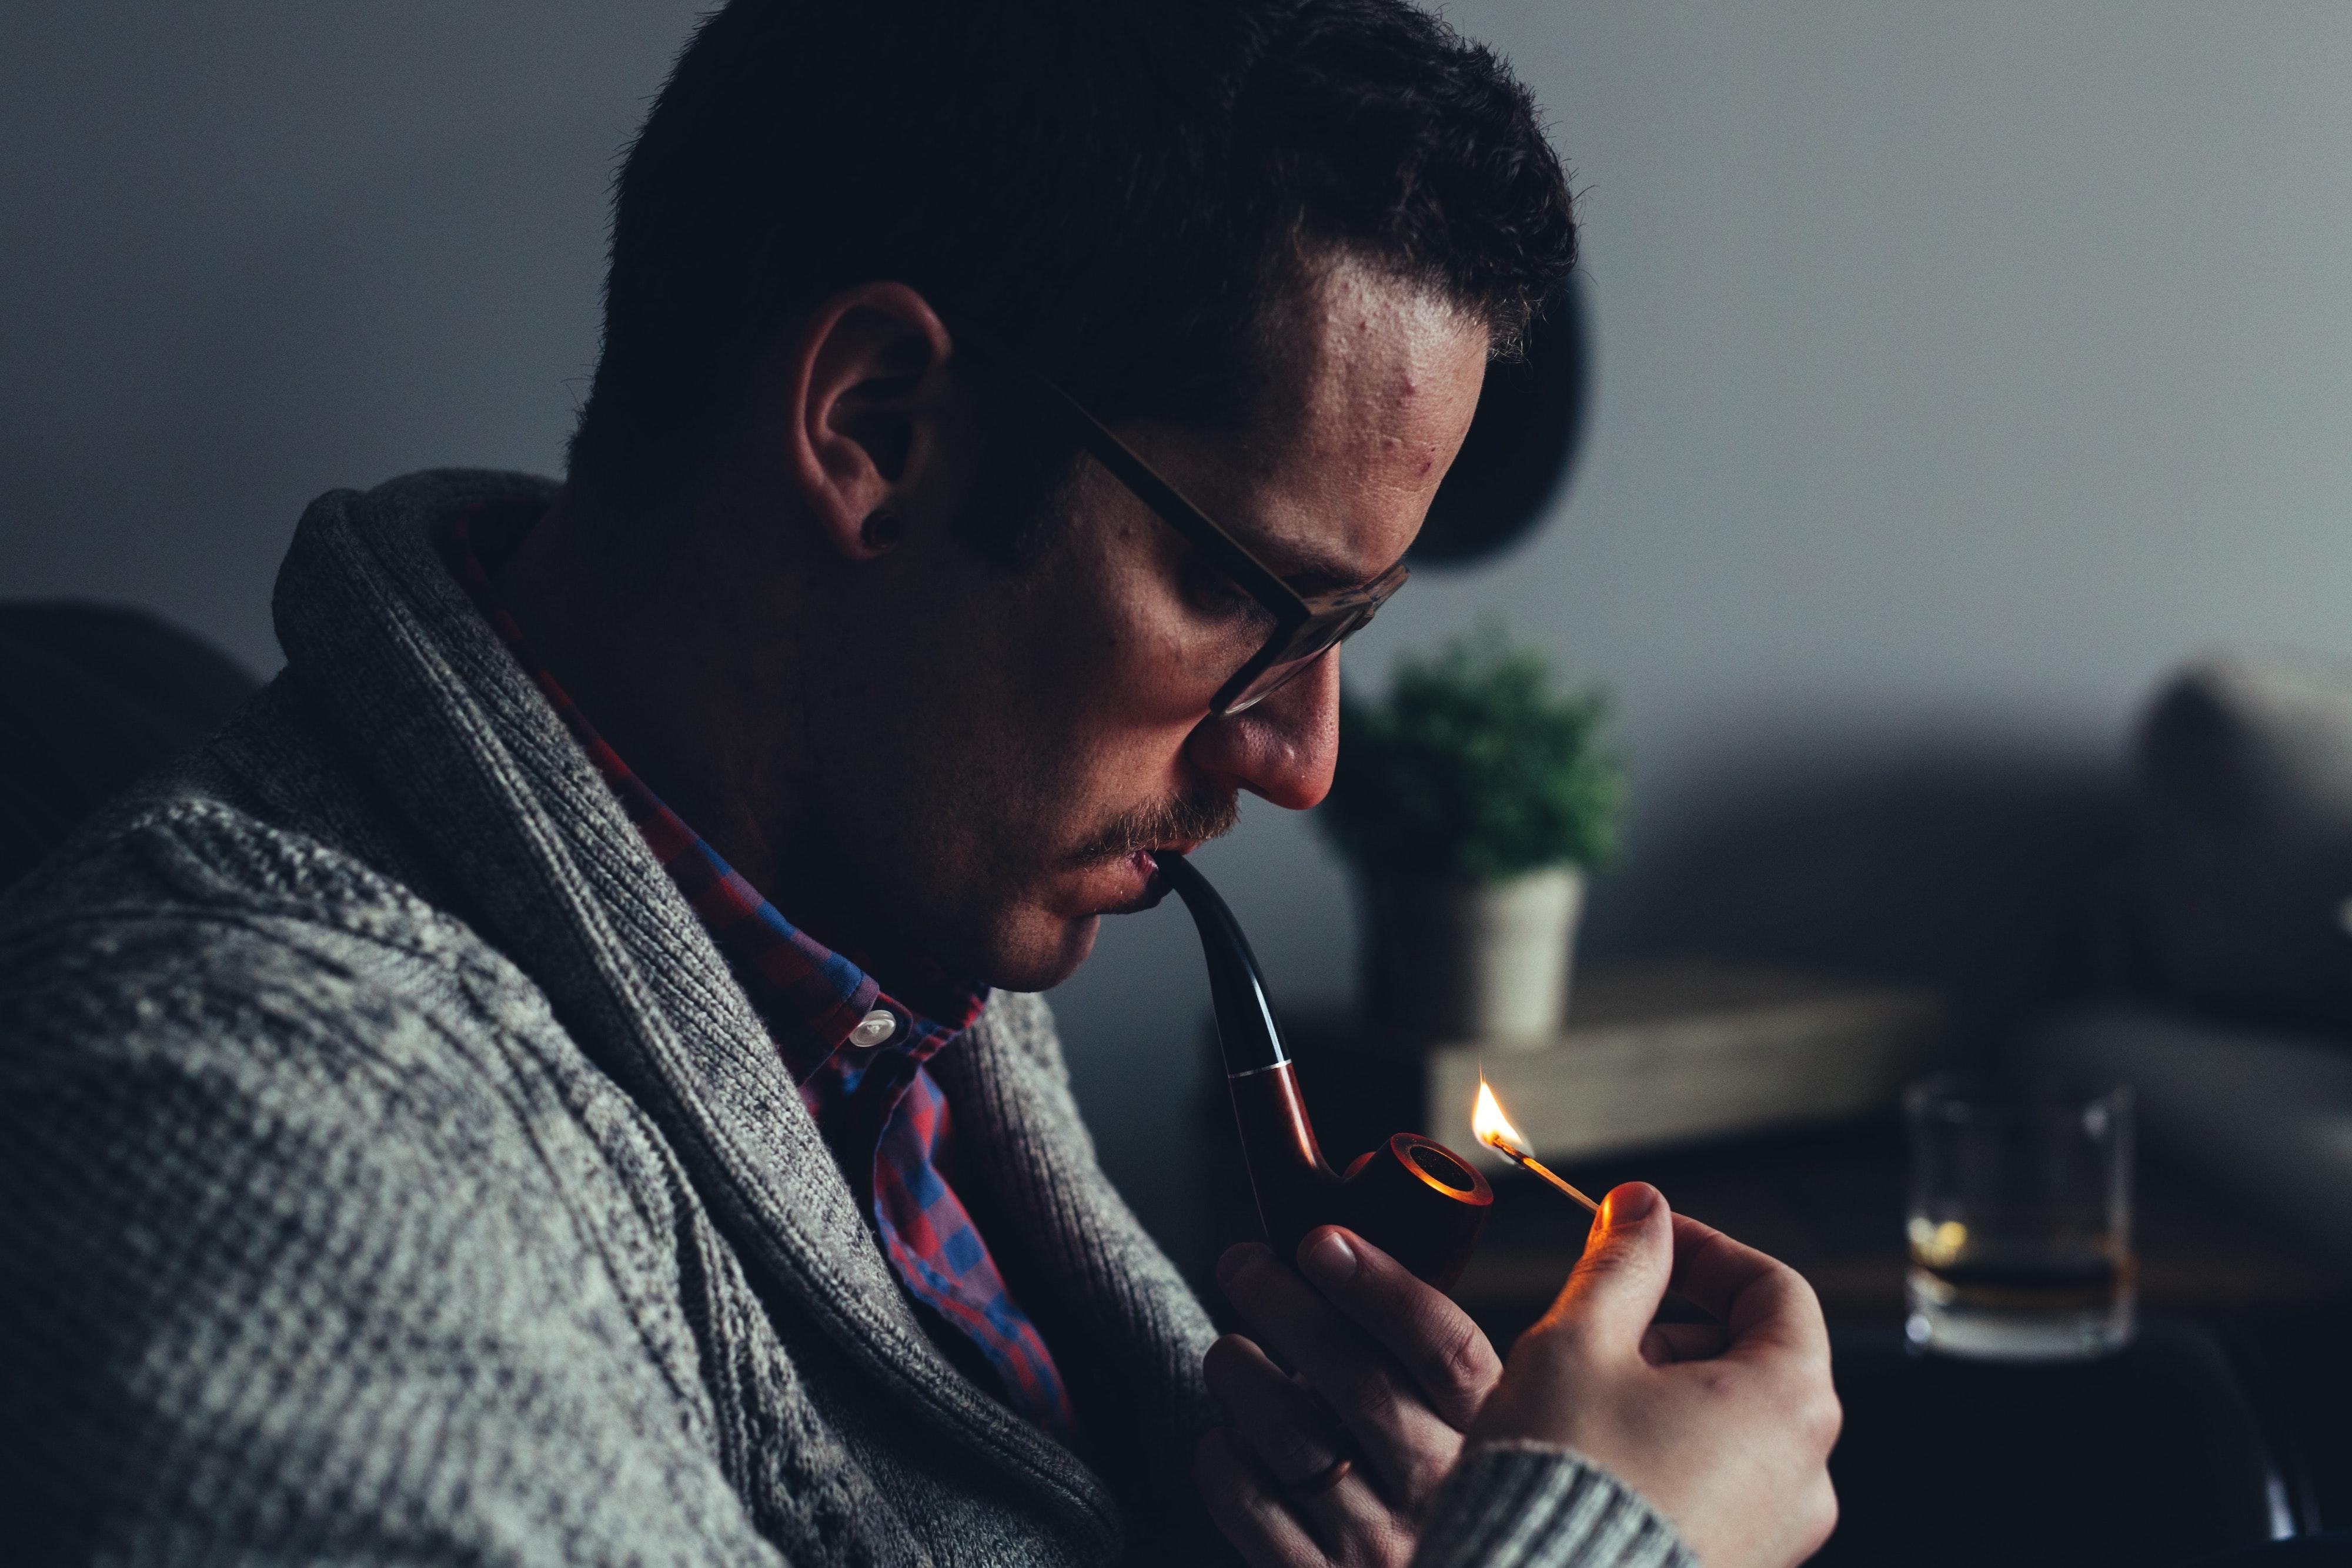 A man lighting a pipe